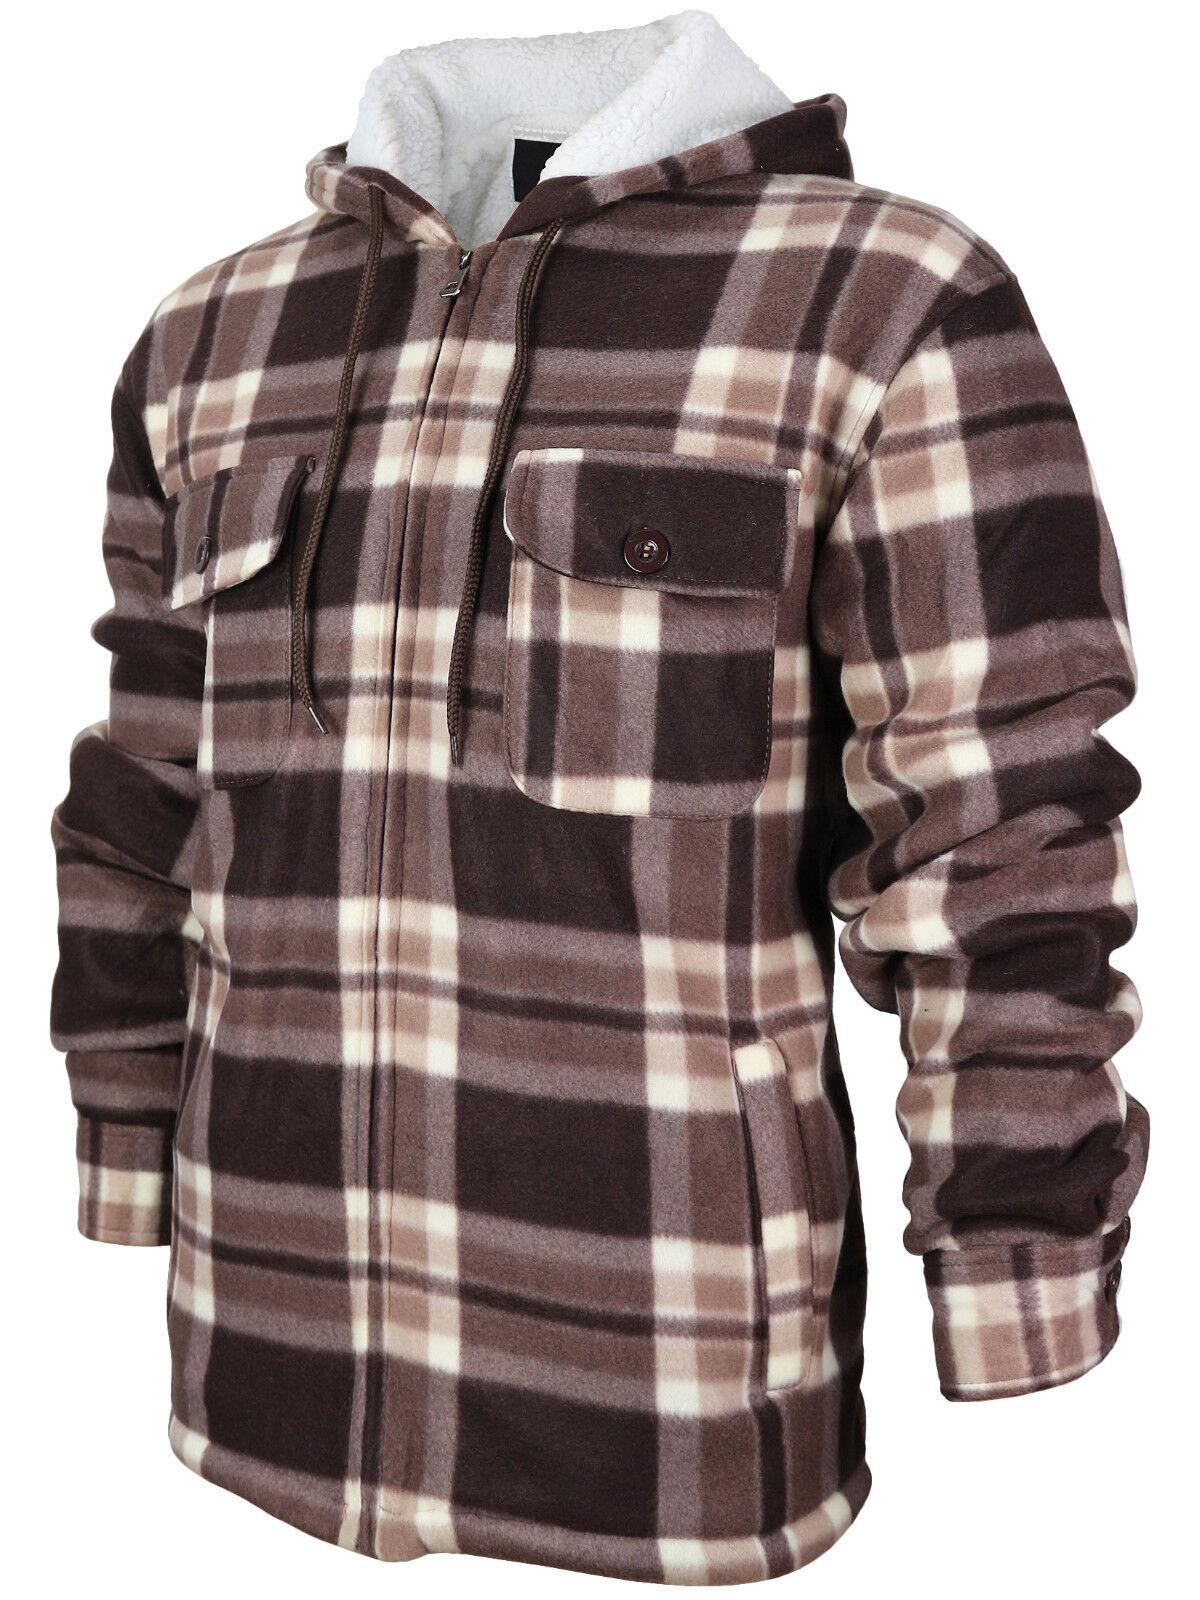 Men's Heavy Fleece Lined Sherpa Hoodie Plaid Flannel Jacket With Hood MFJ130 - Brown